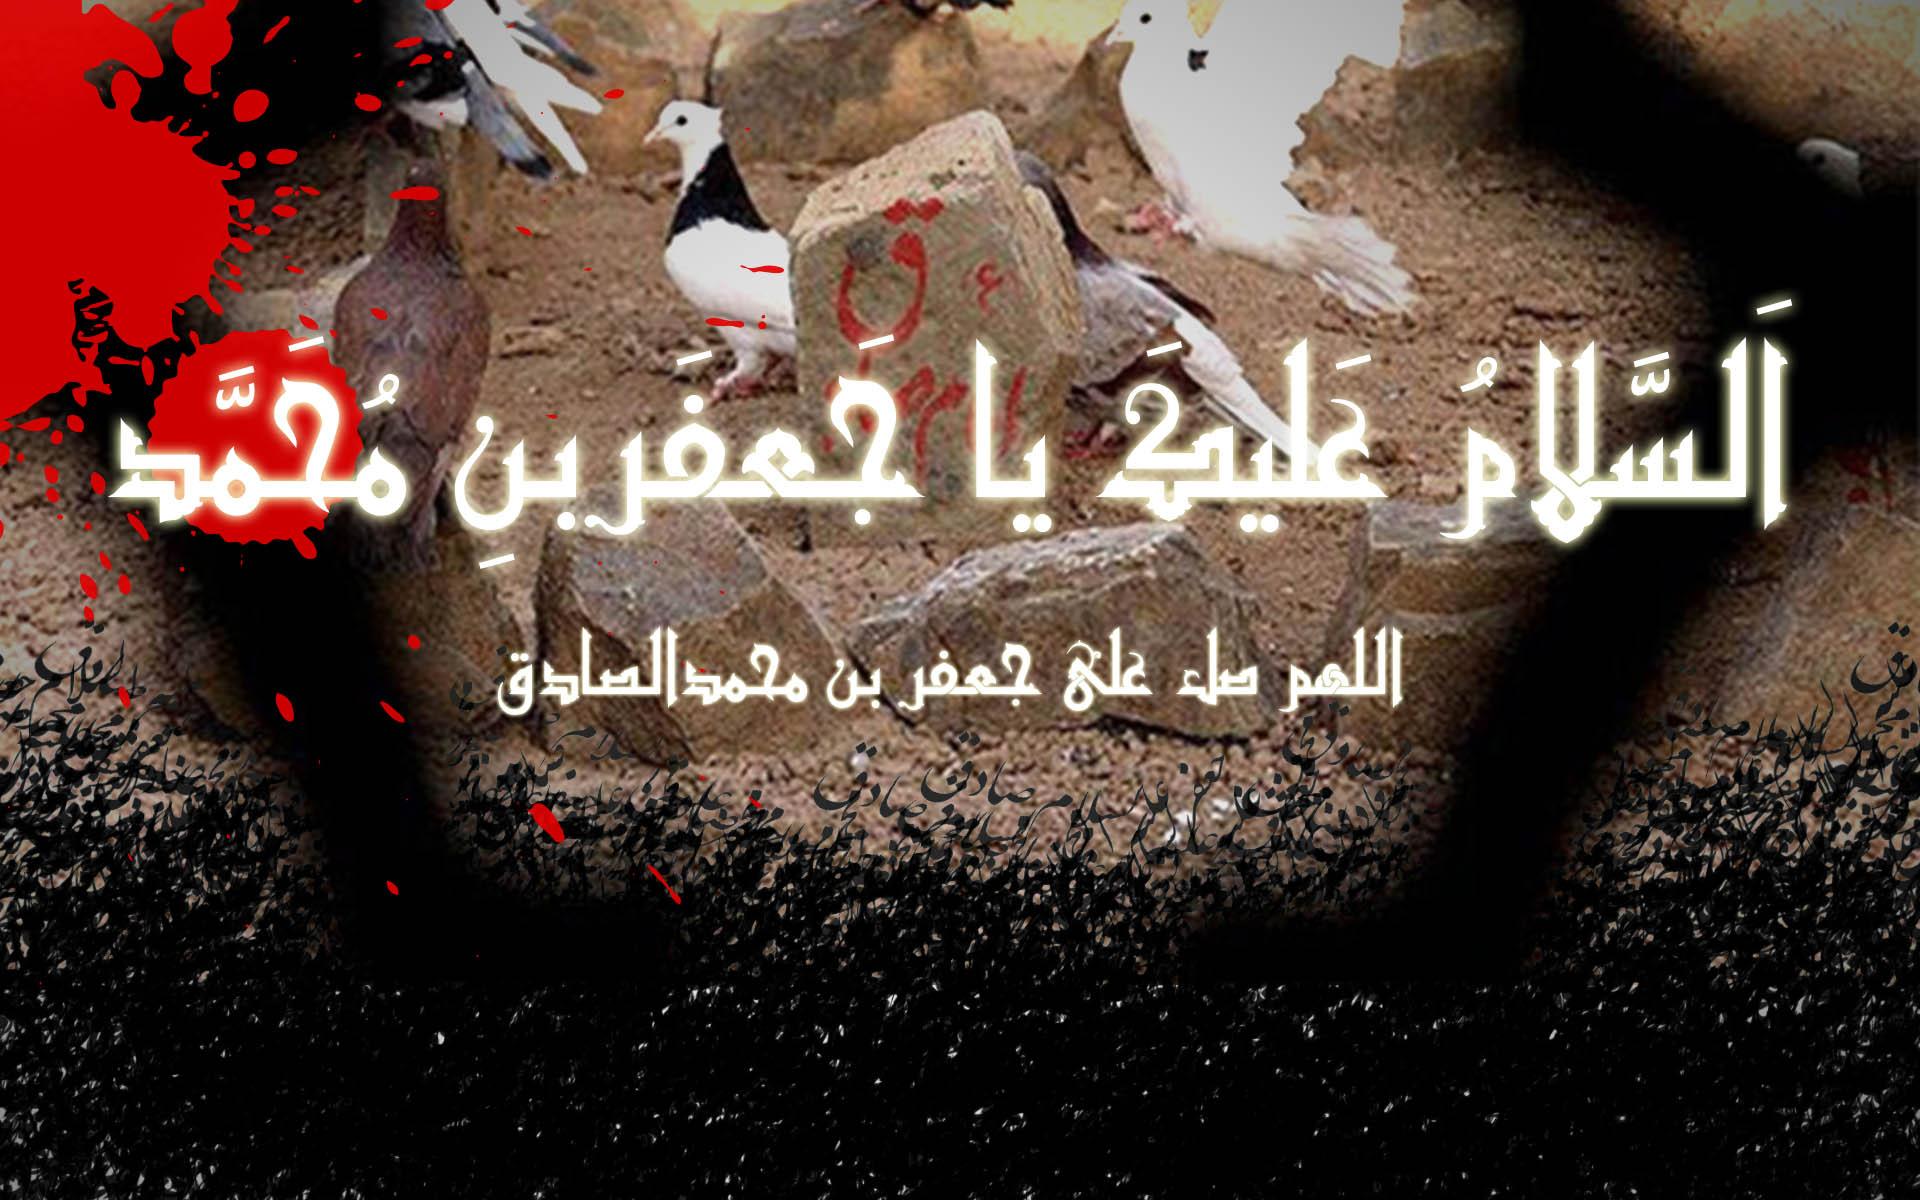 پوستر به مناسبت شهادت امام صادق علیه السلام